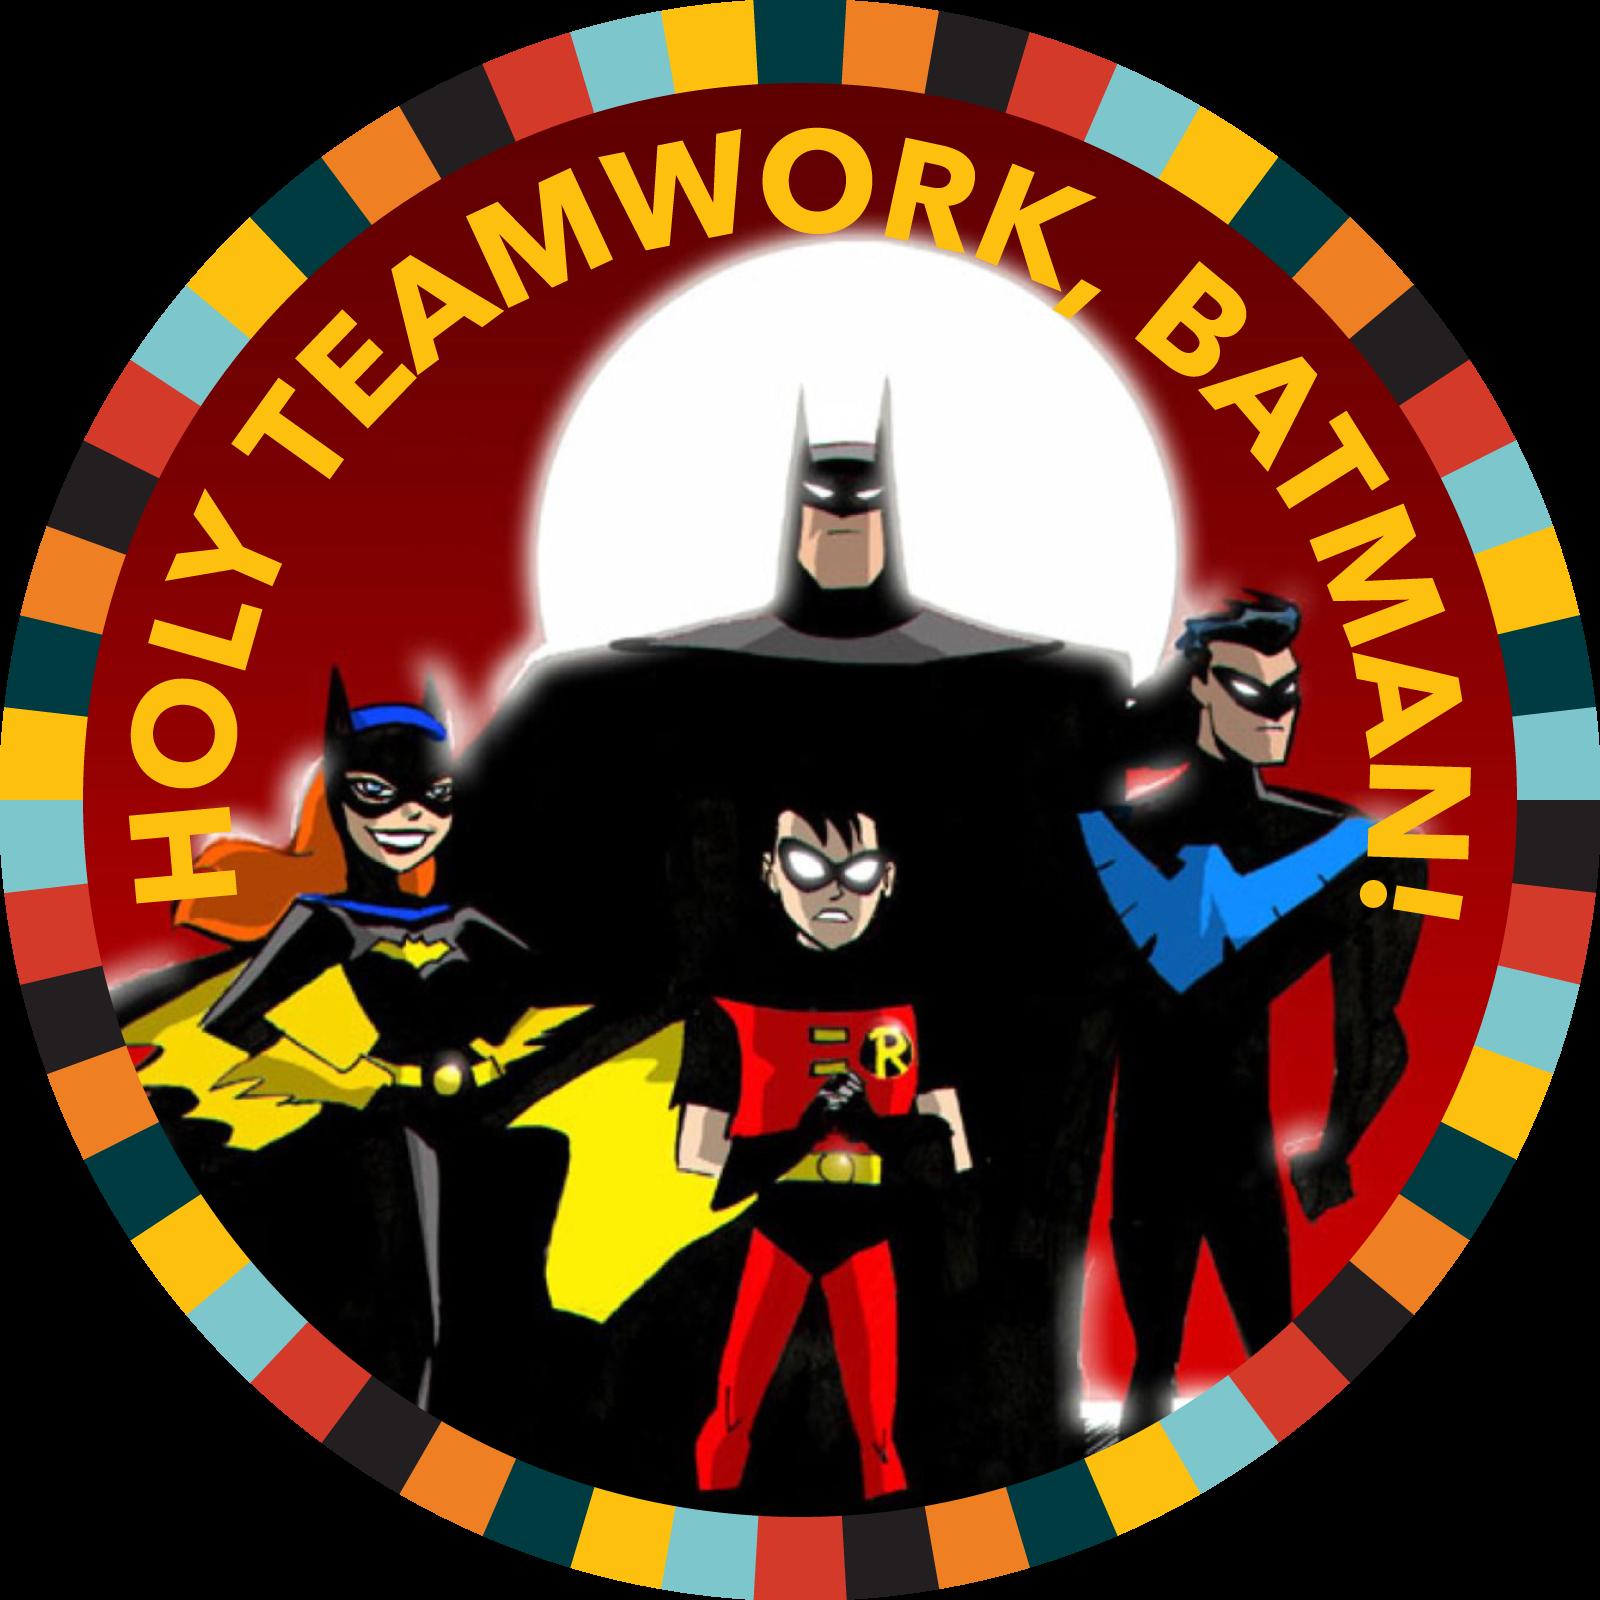 Holy Teamwork, Batman!